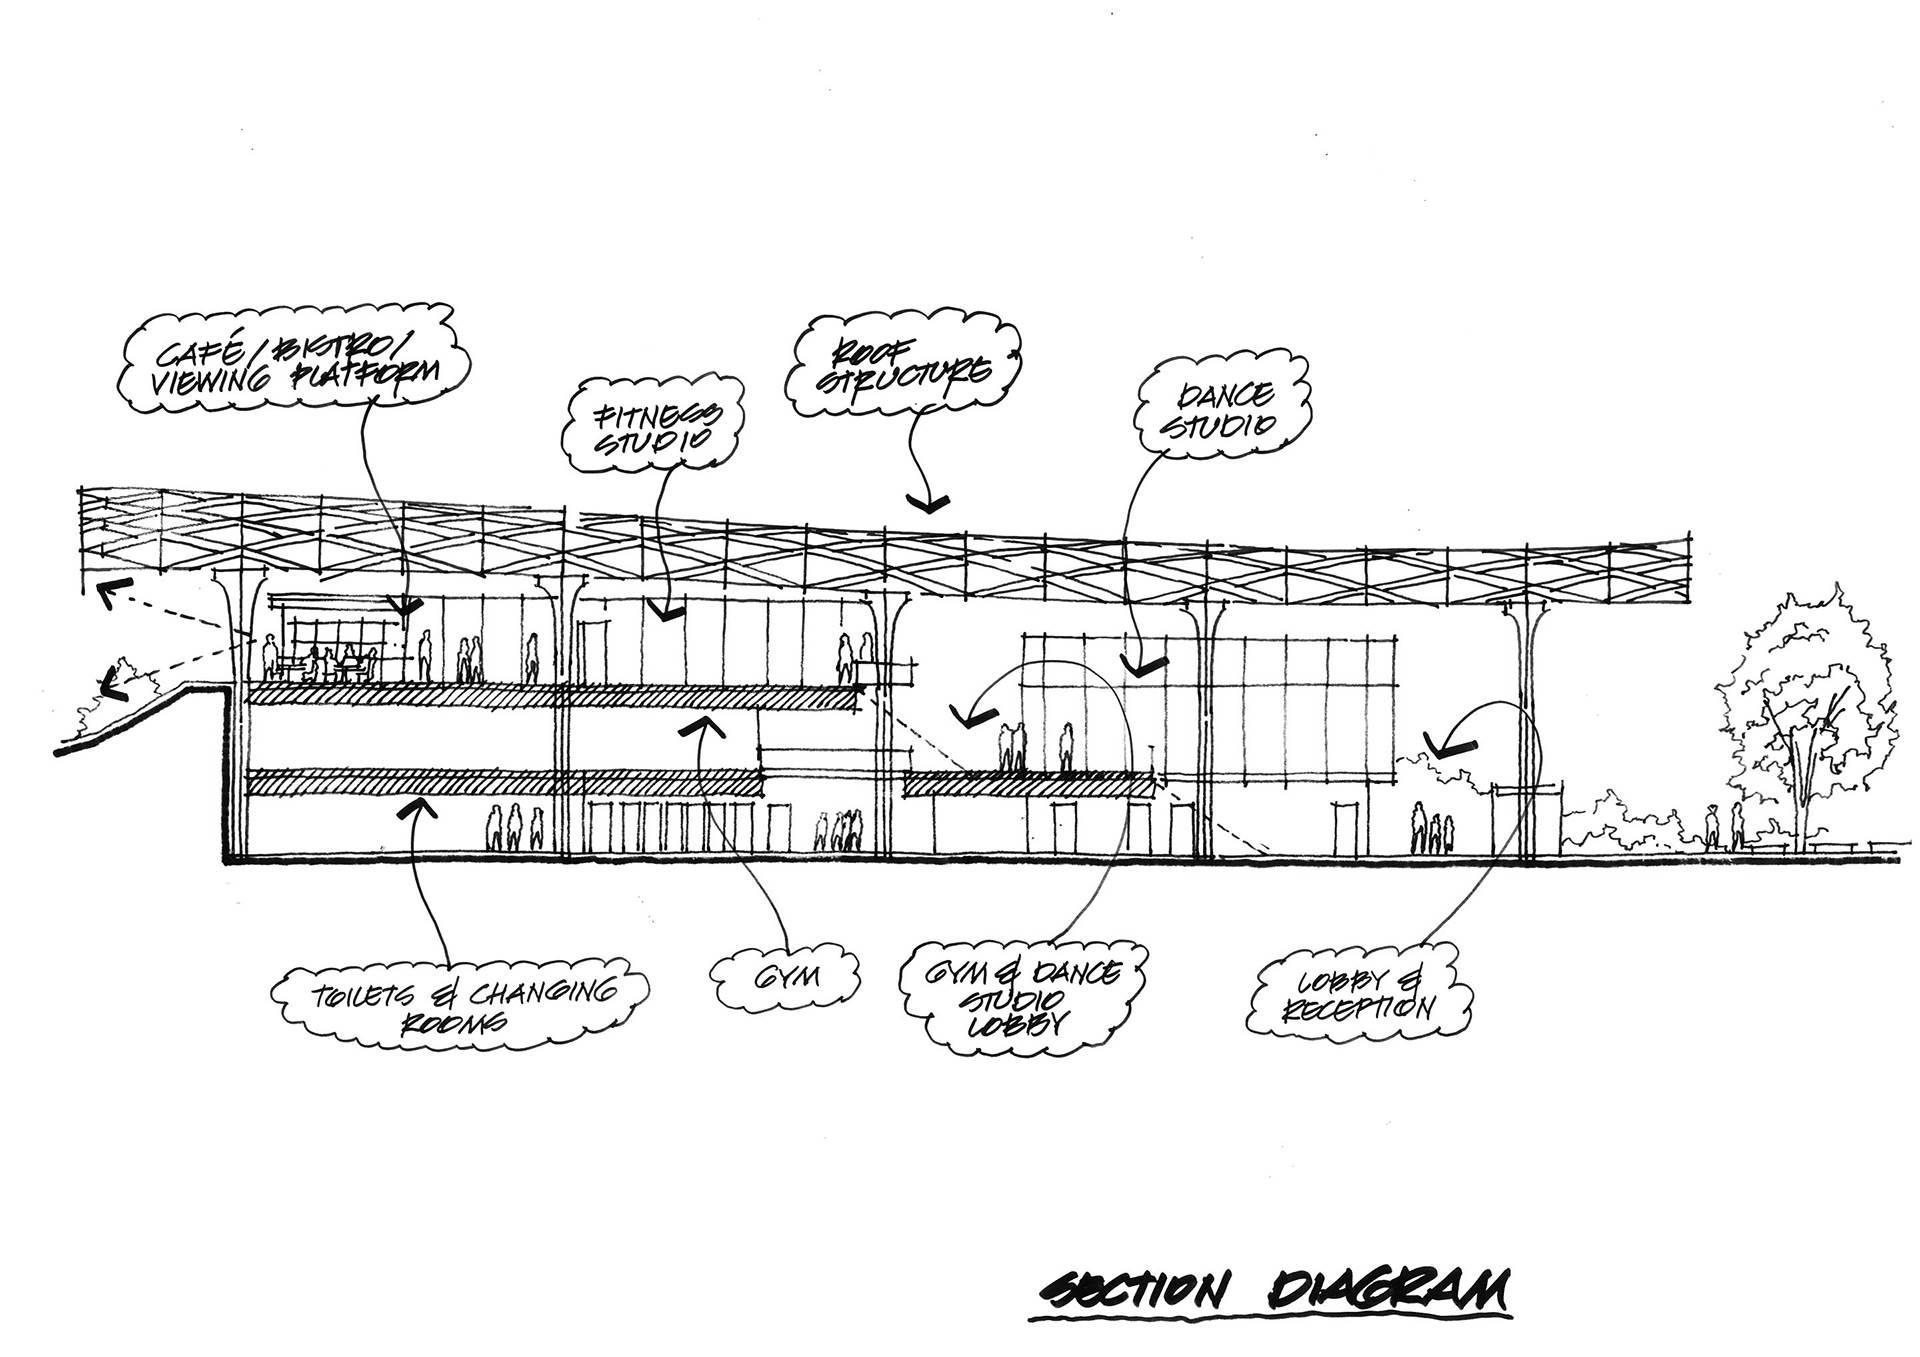 Section-Diagram-01-Sketch__Web_1920_c100.jpg